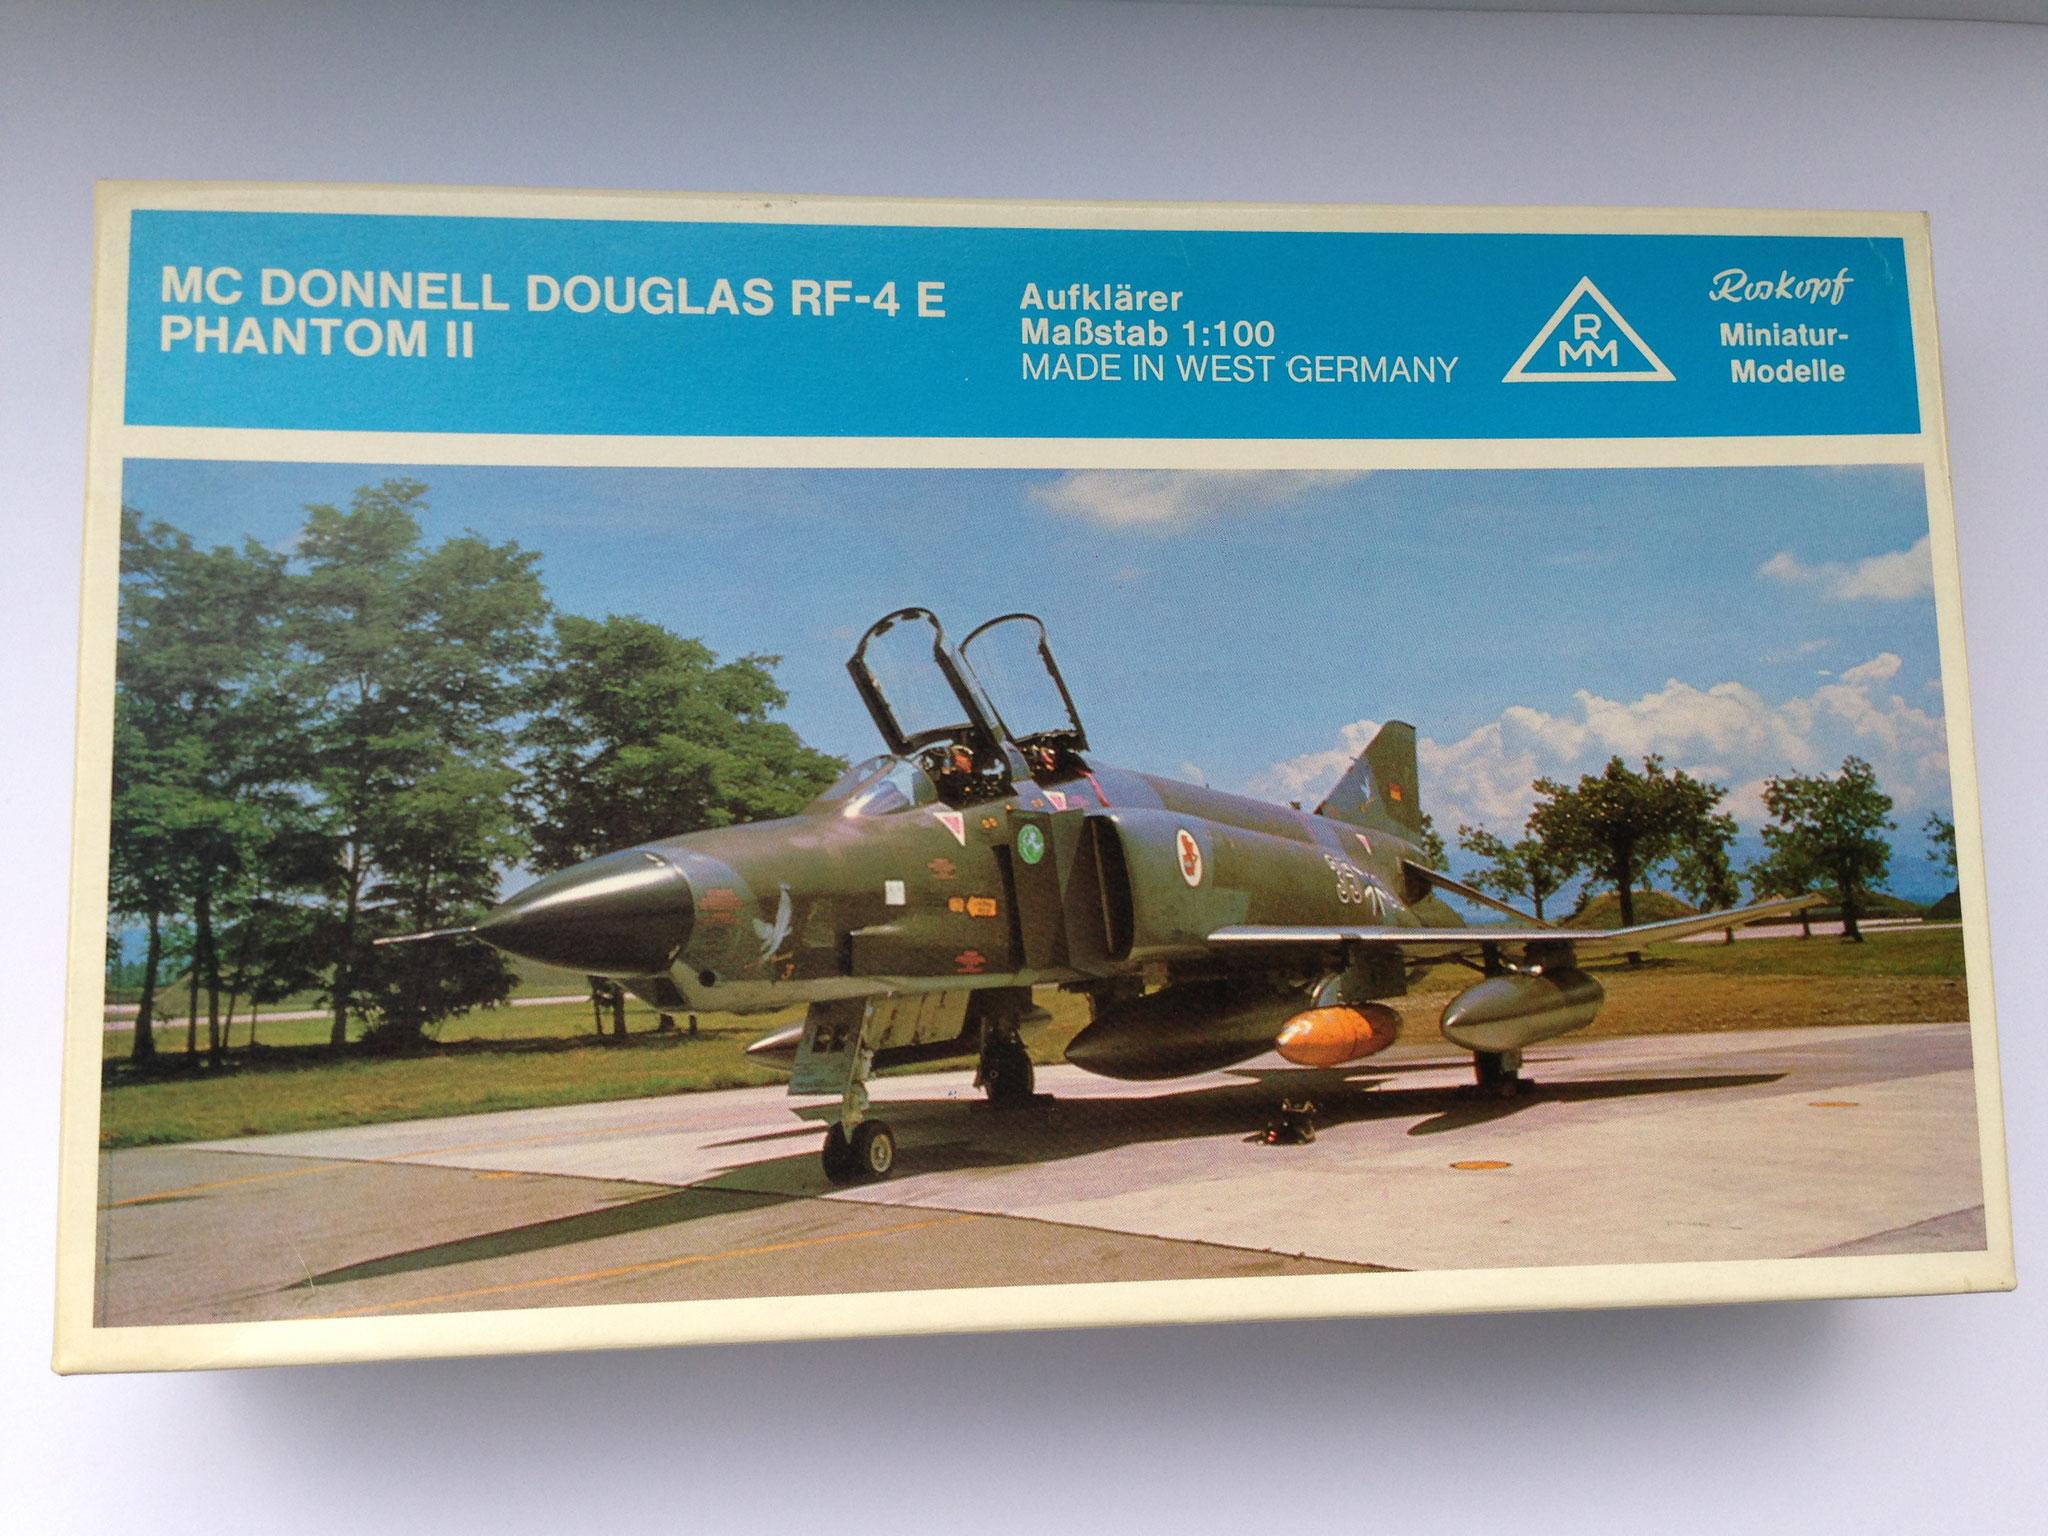 RF-4 E Phantom II Aufklärungsflugzeug der Bundesluftwaffe, Bausatz, Art. Nr. 93 (ab 1981 im Programm)